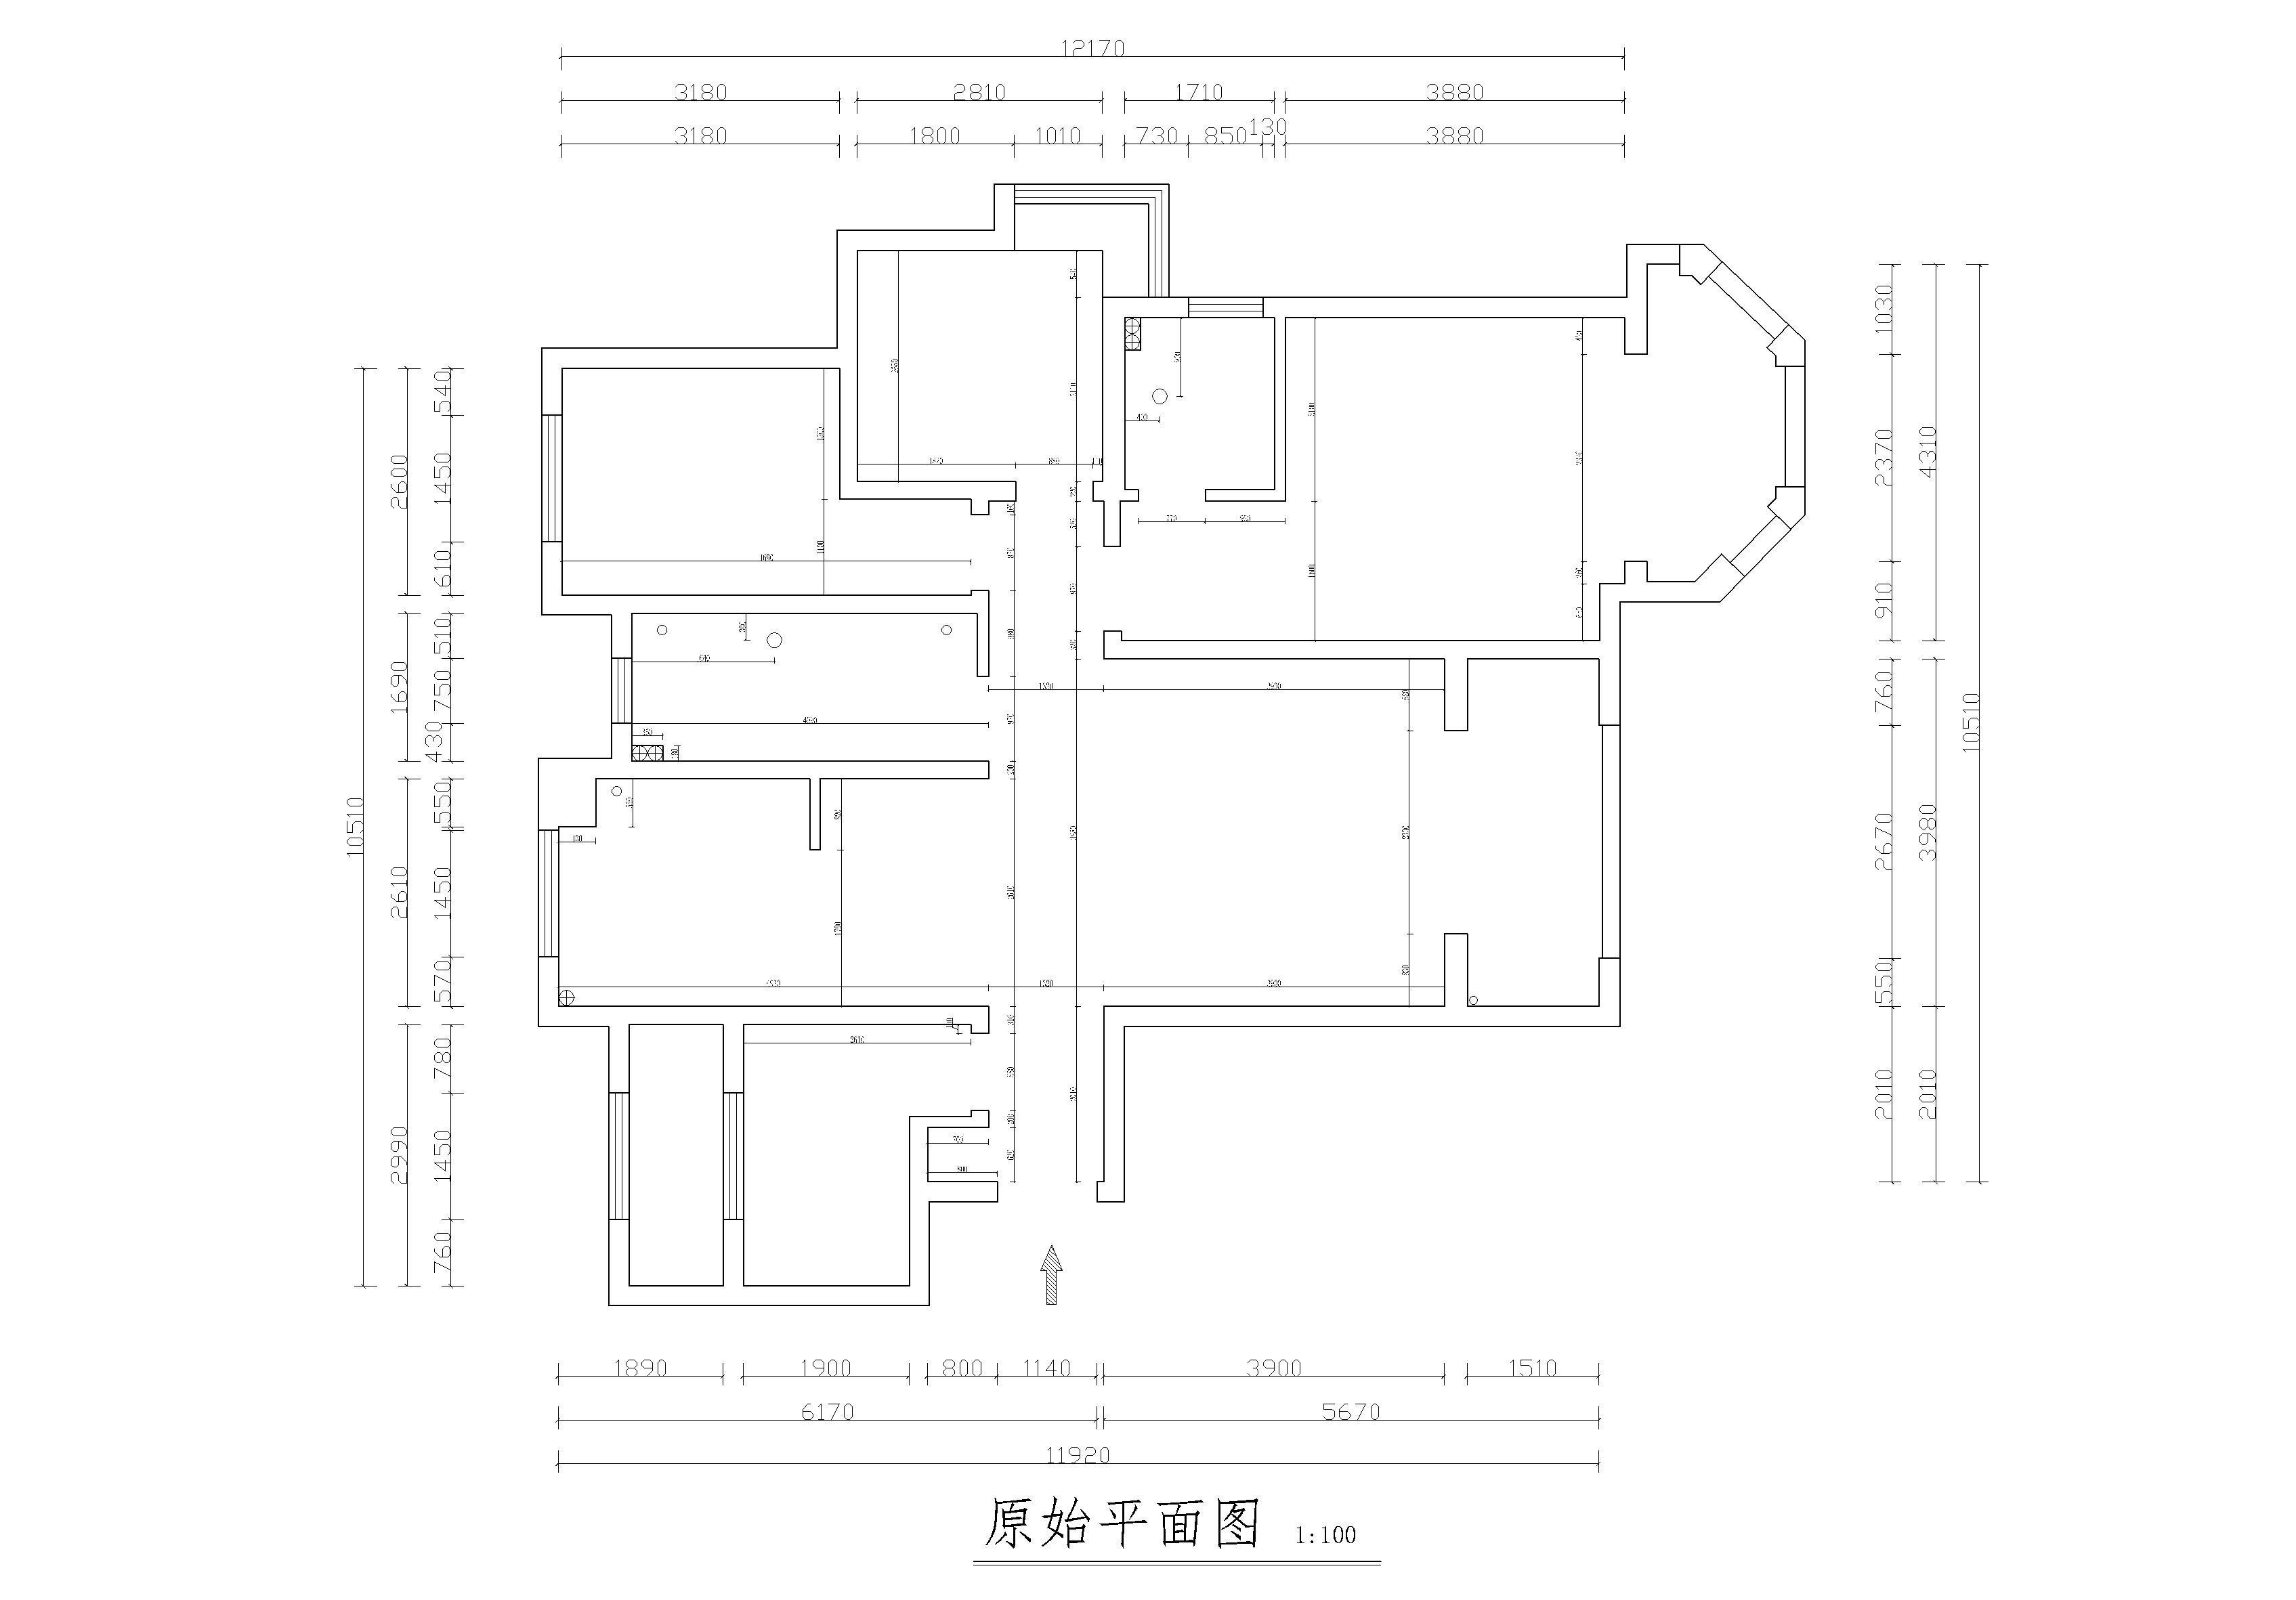 中南2901-Model.jpg